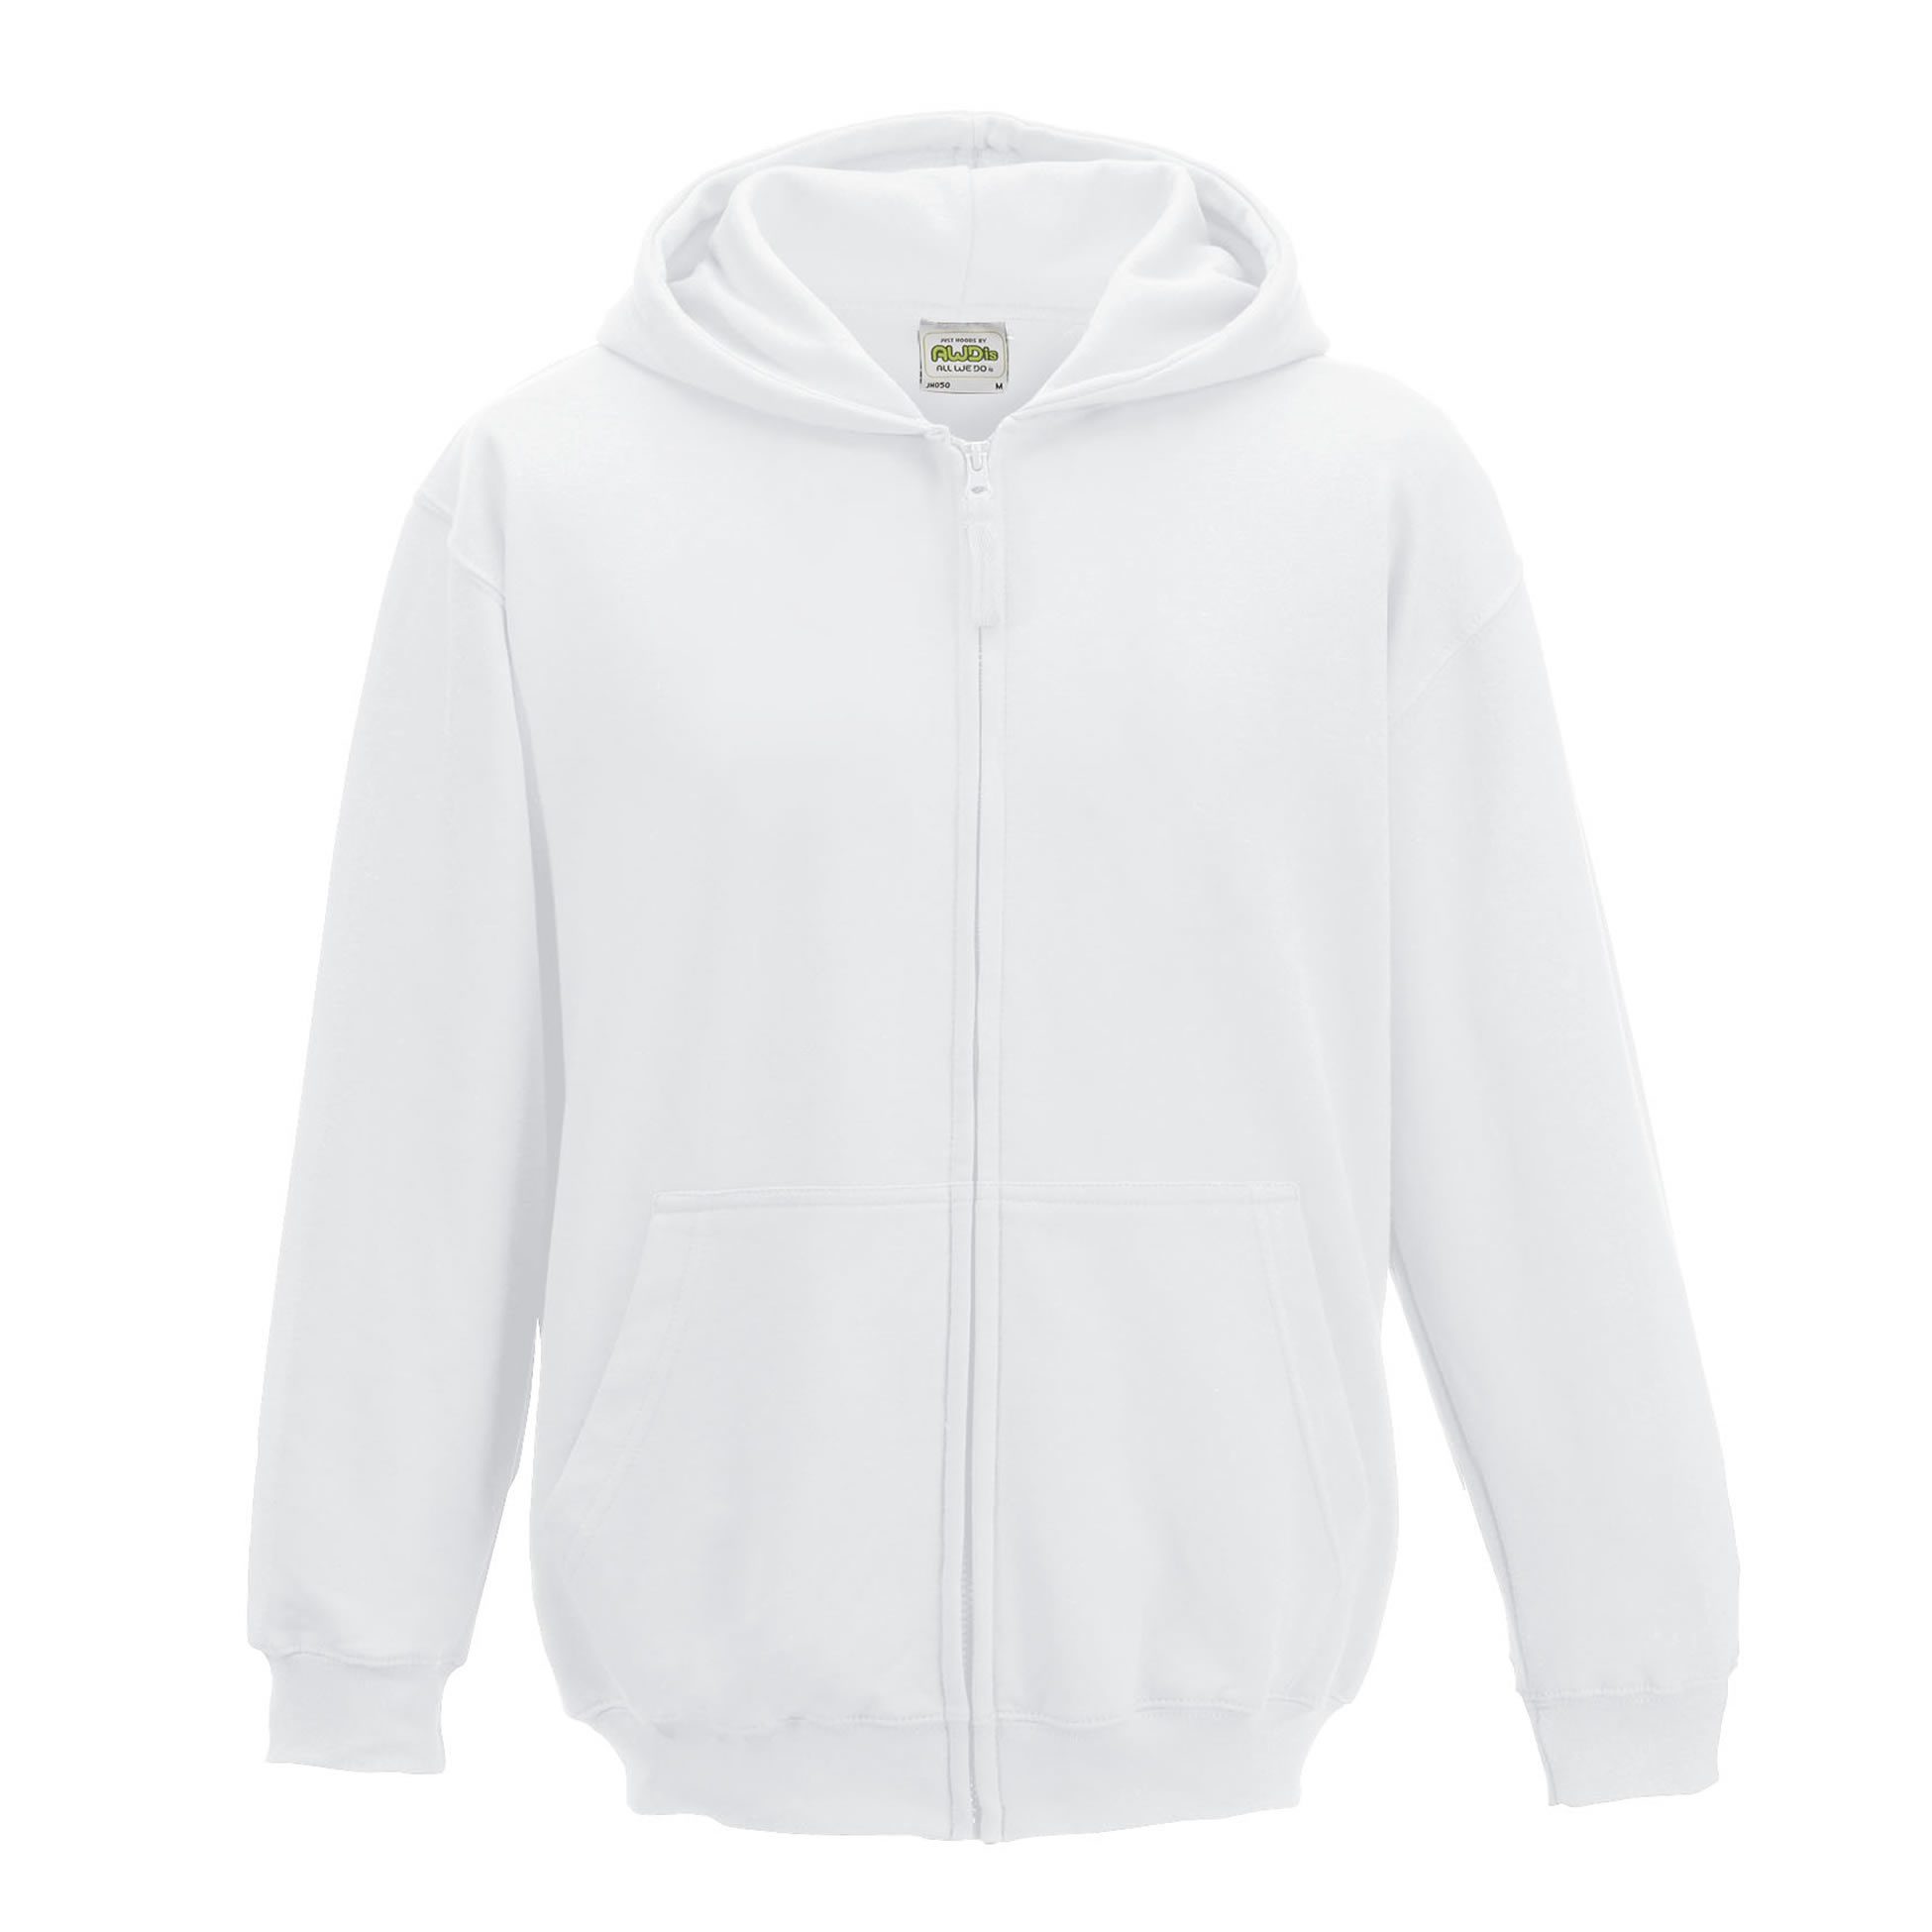 AWDis Zipped Hooded Sweatshirt JH50J Boys Girls Childrens Kids Hoodie Hoody